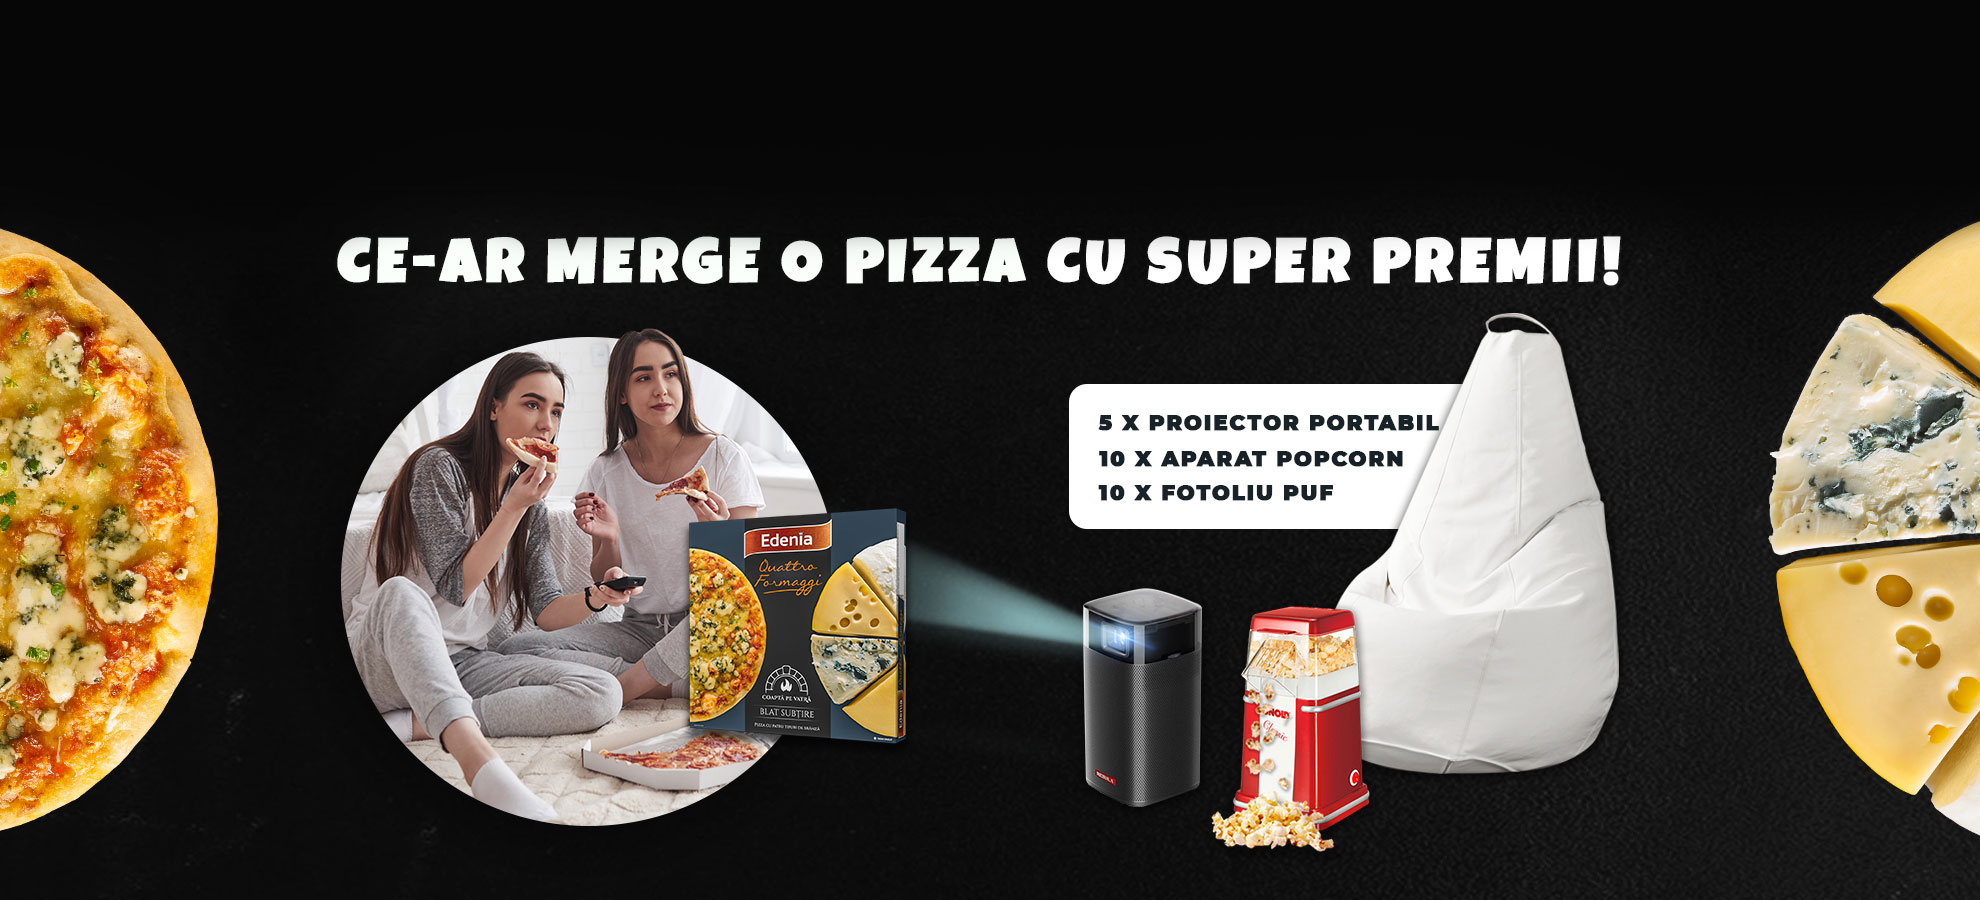 slide-pizza-premii-1